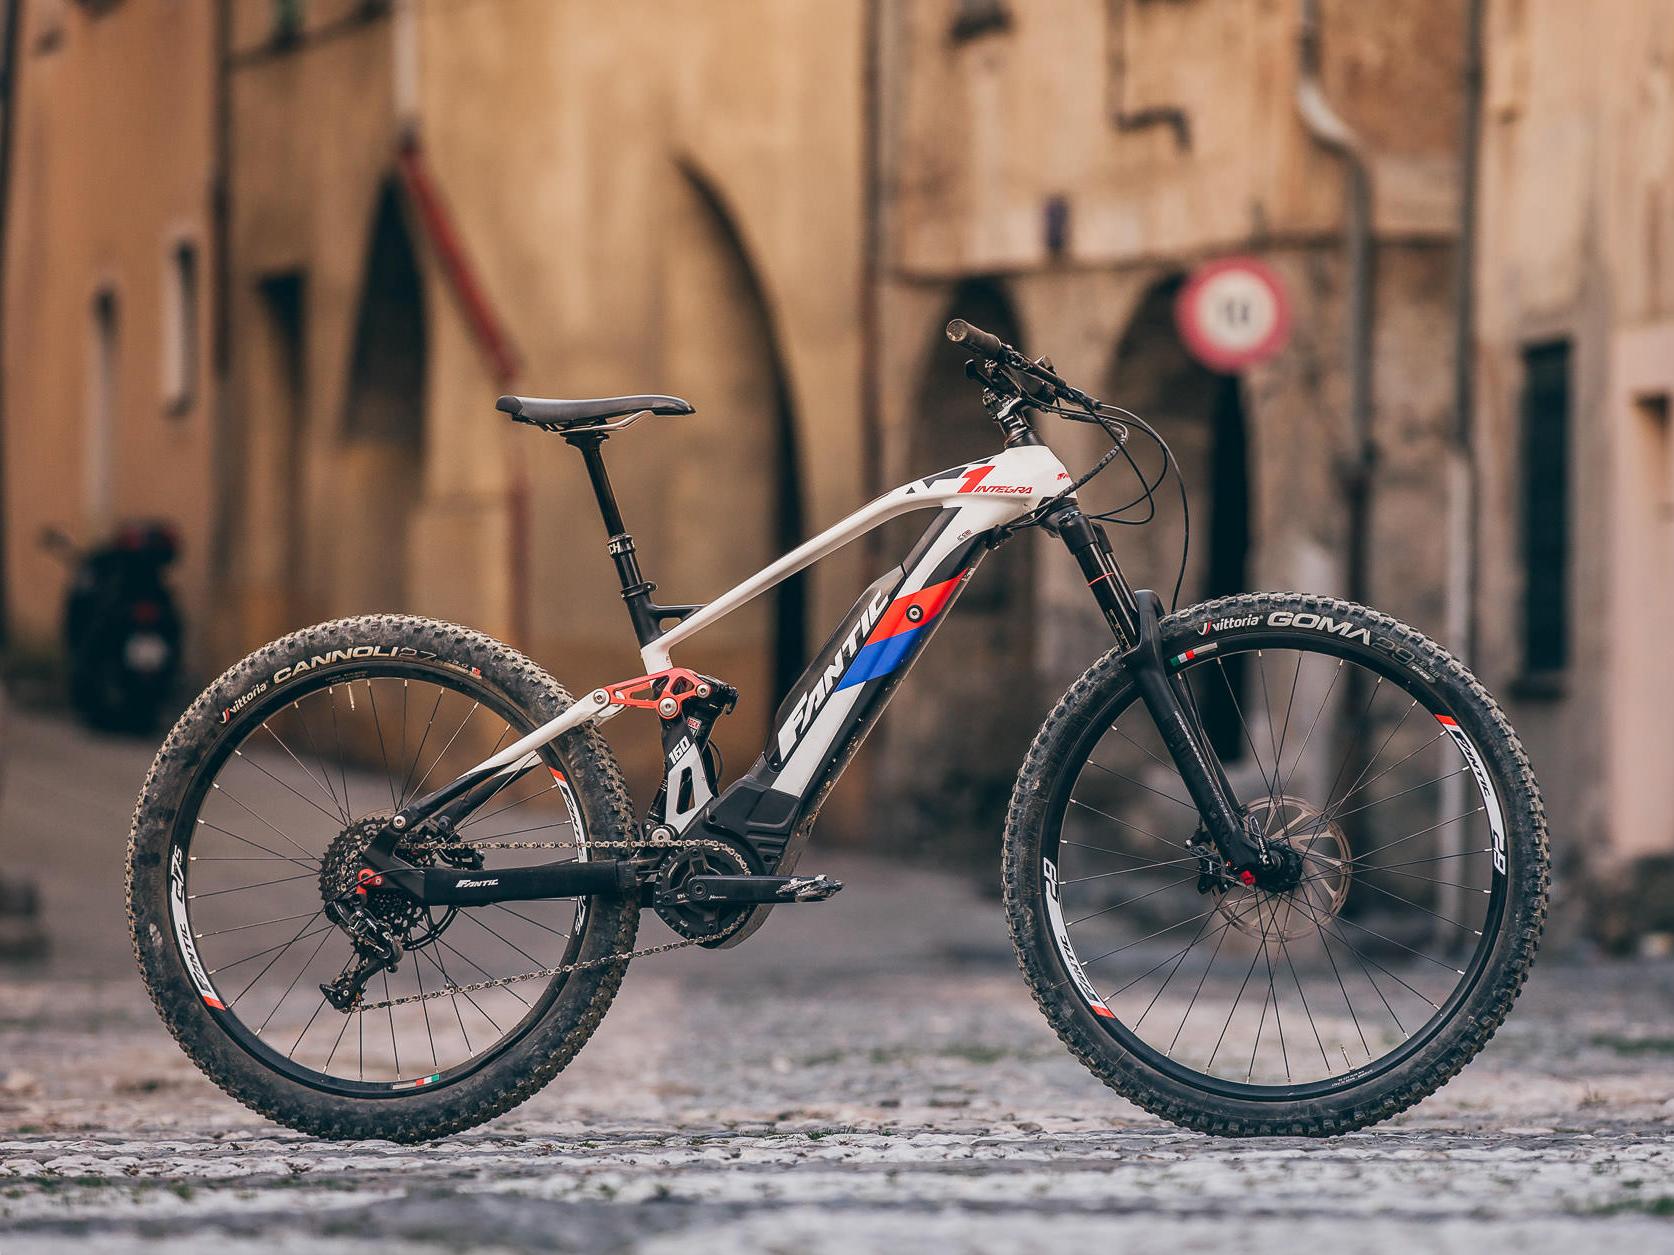 Fantic XF1 Integra Carbon 160 bike 2018.jpg